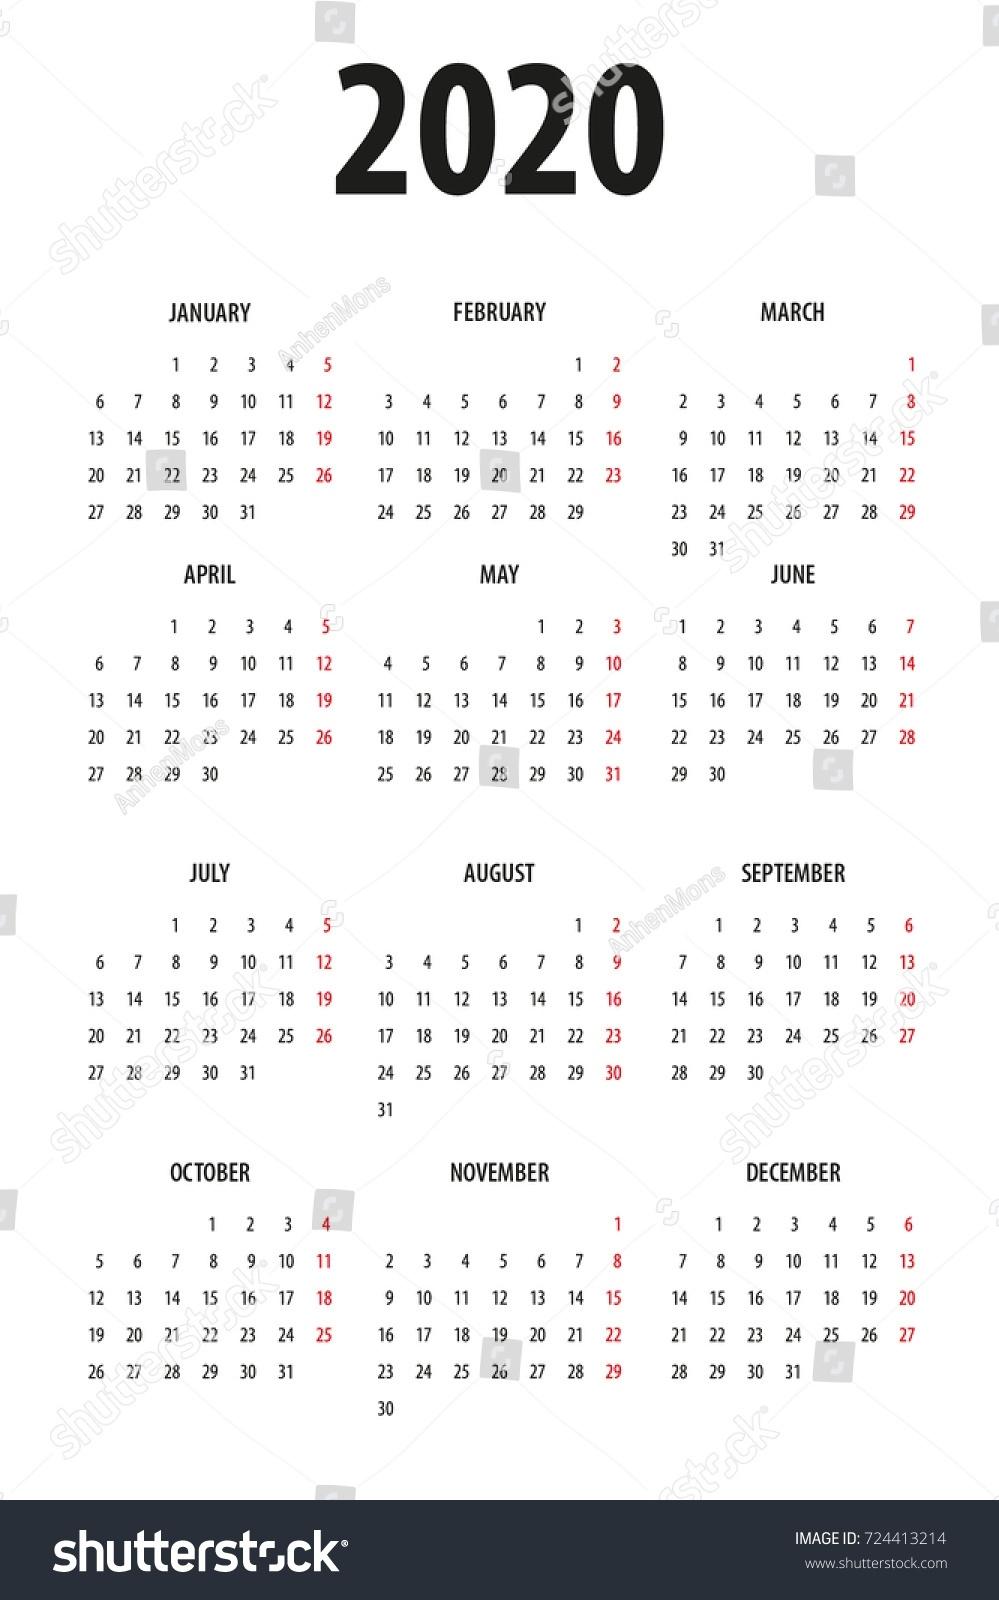 Simple Calendar Template 2020 On White Stock Vector (Royalty Free 2020 Calendar Monday To Sunday